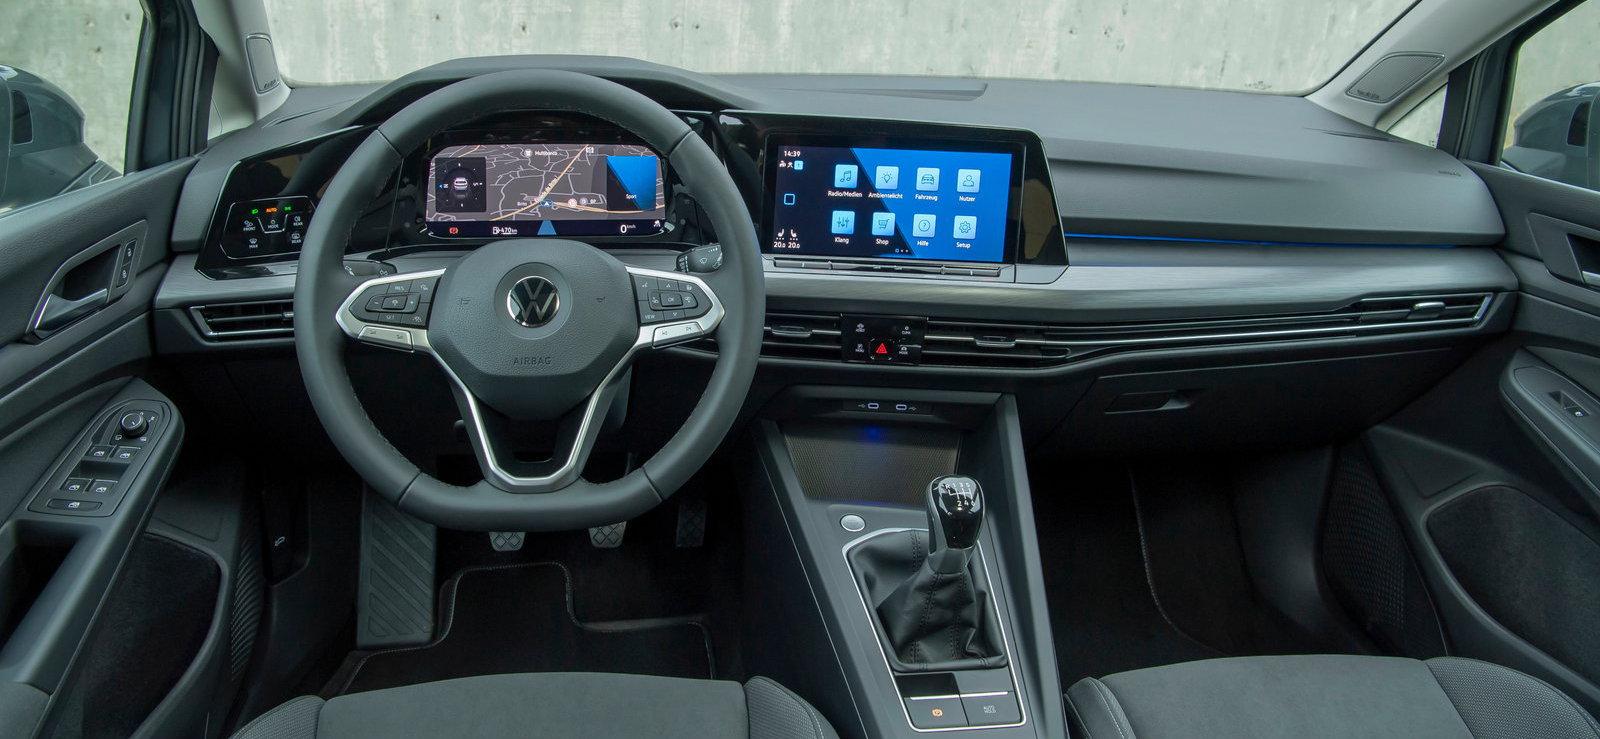 VW GOLF 2020 32